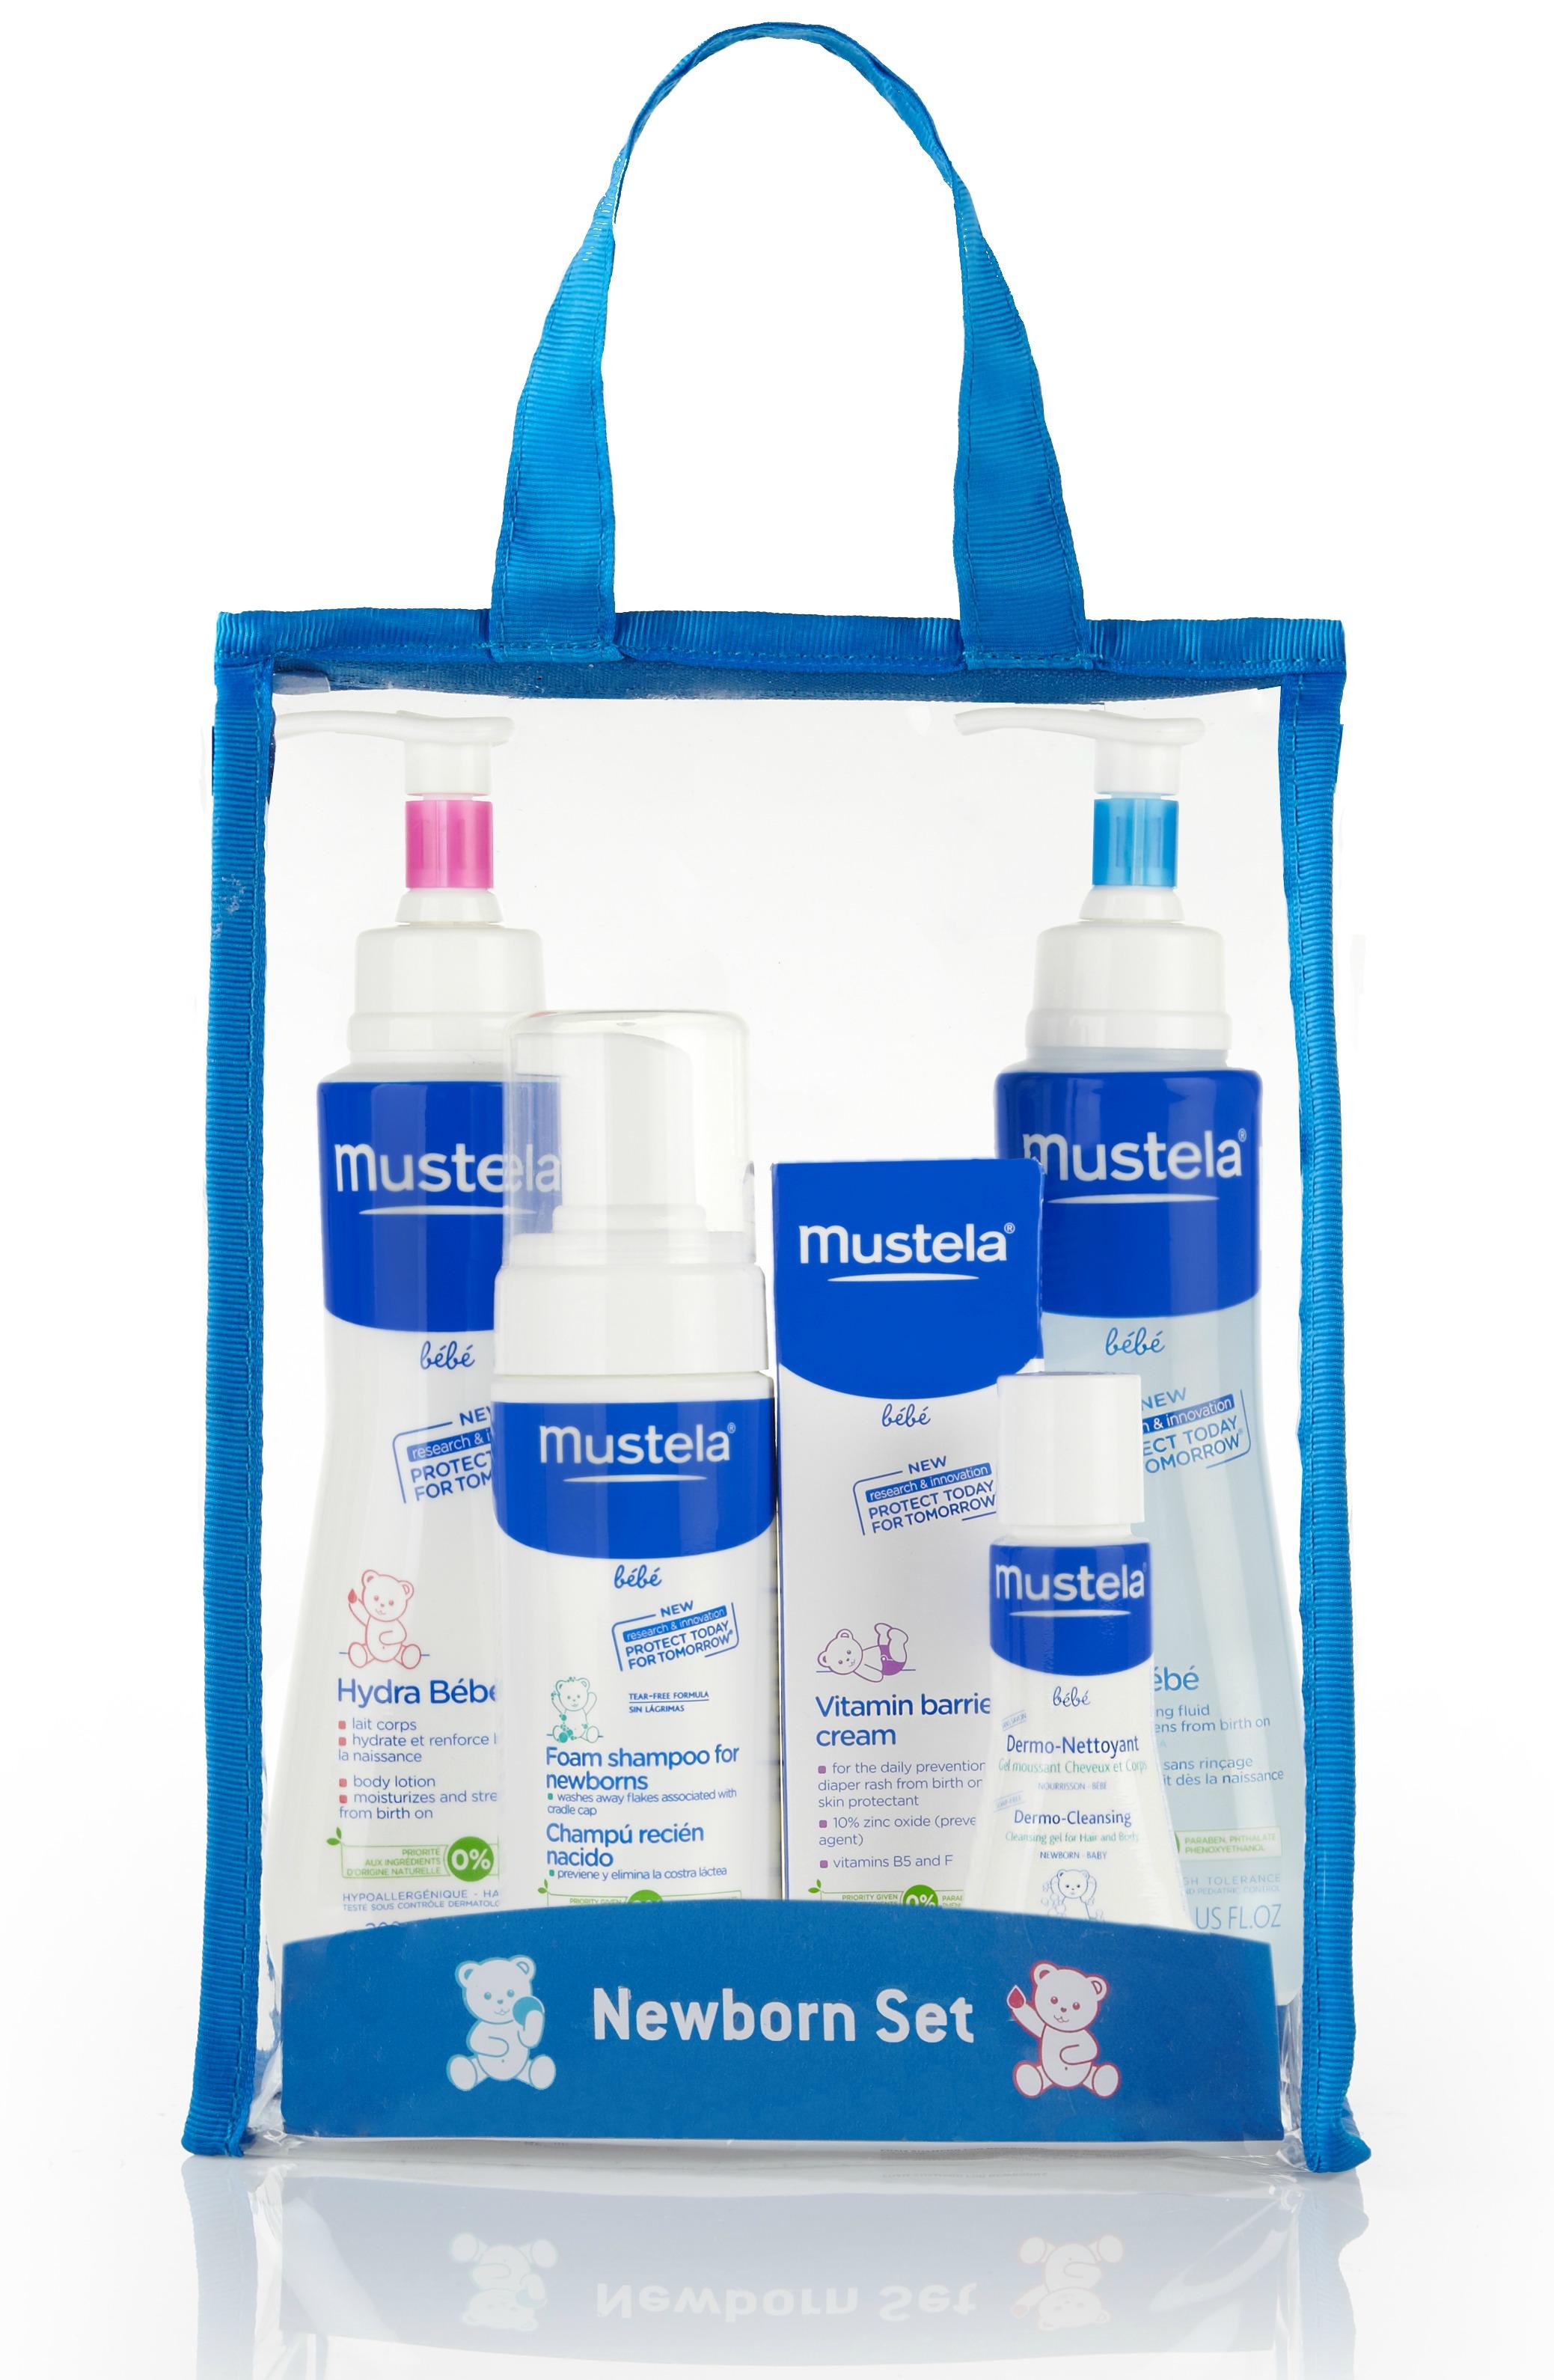 Mustela Newborn Skincare Set